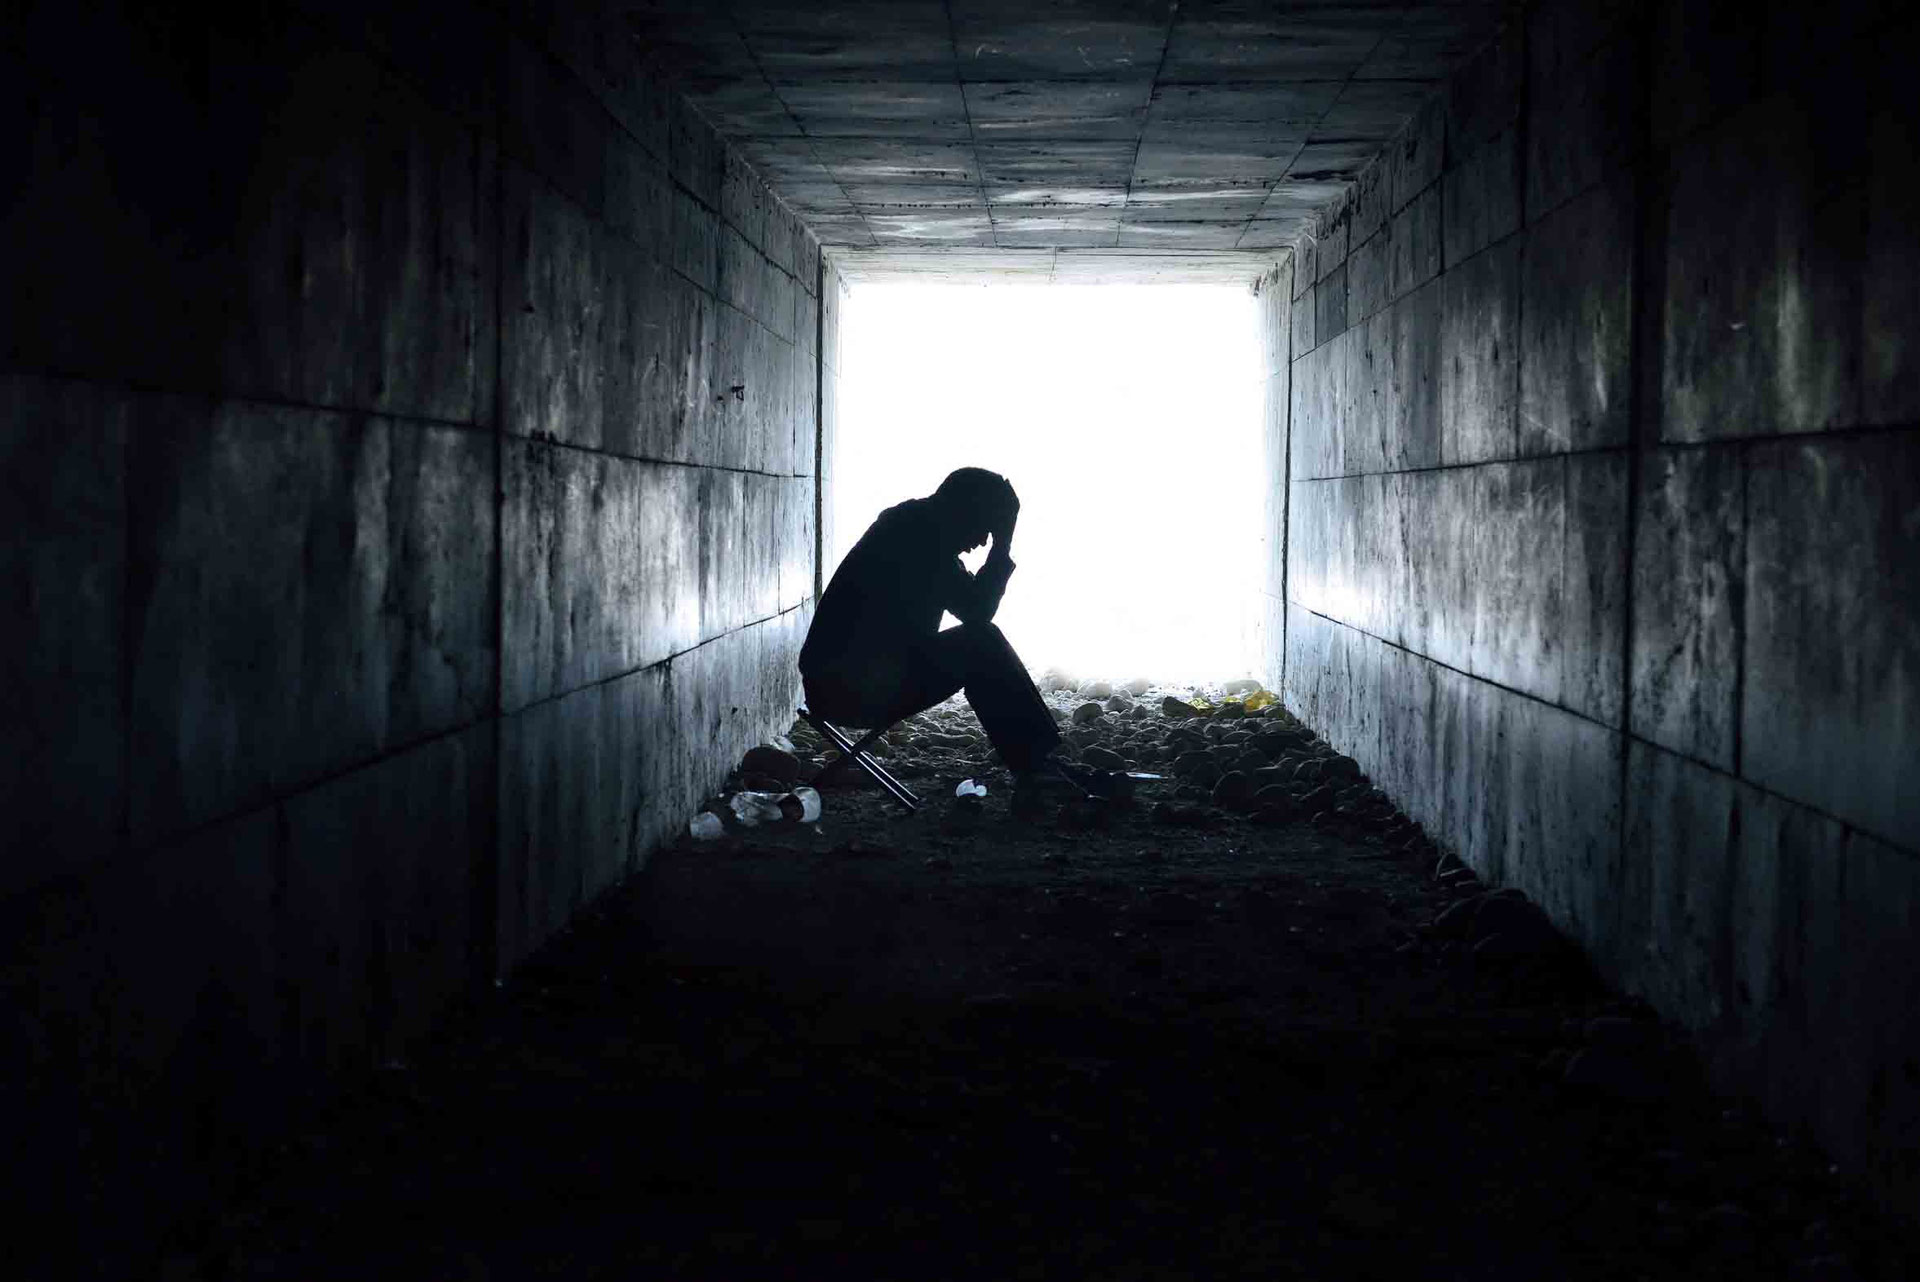 reaktive depression